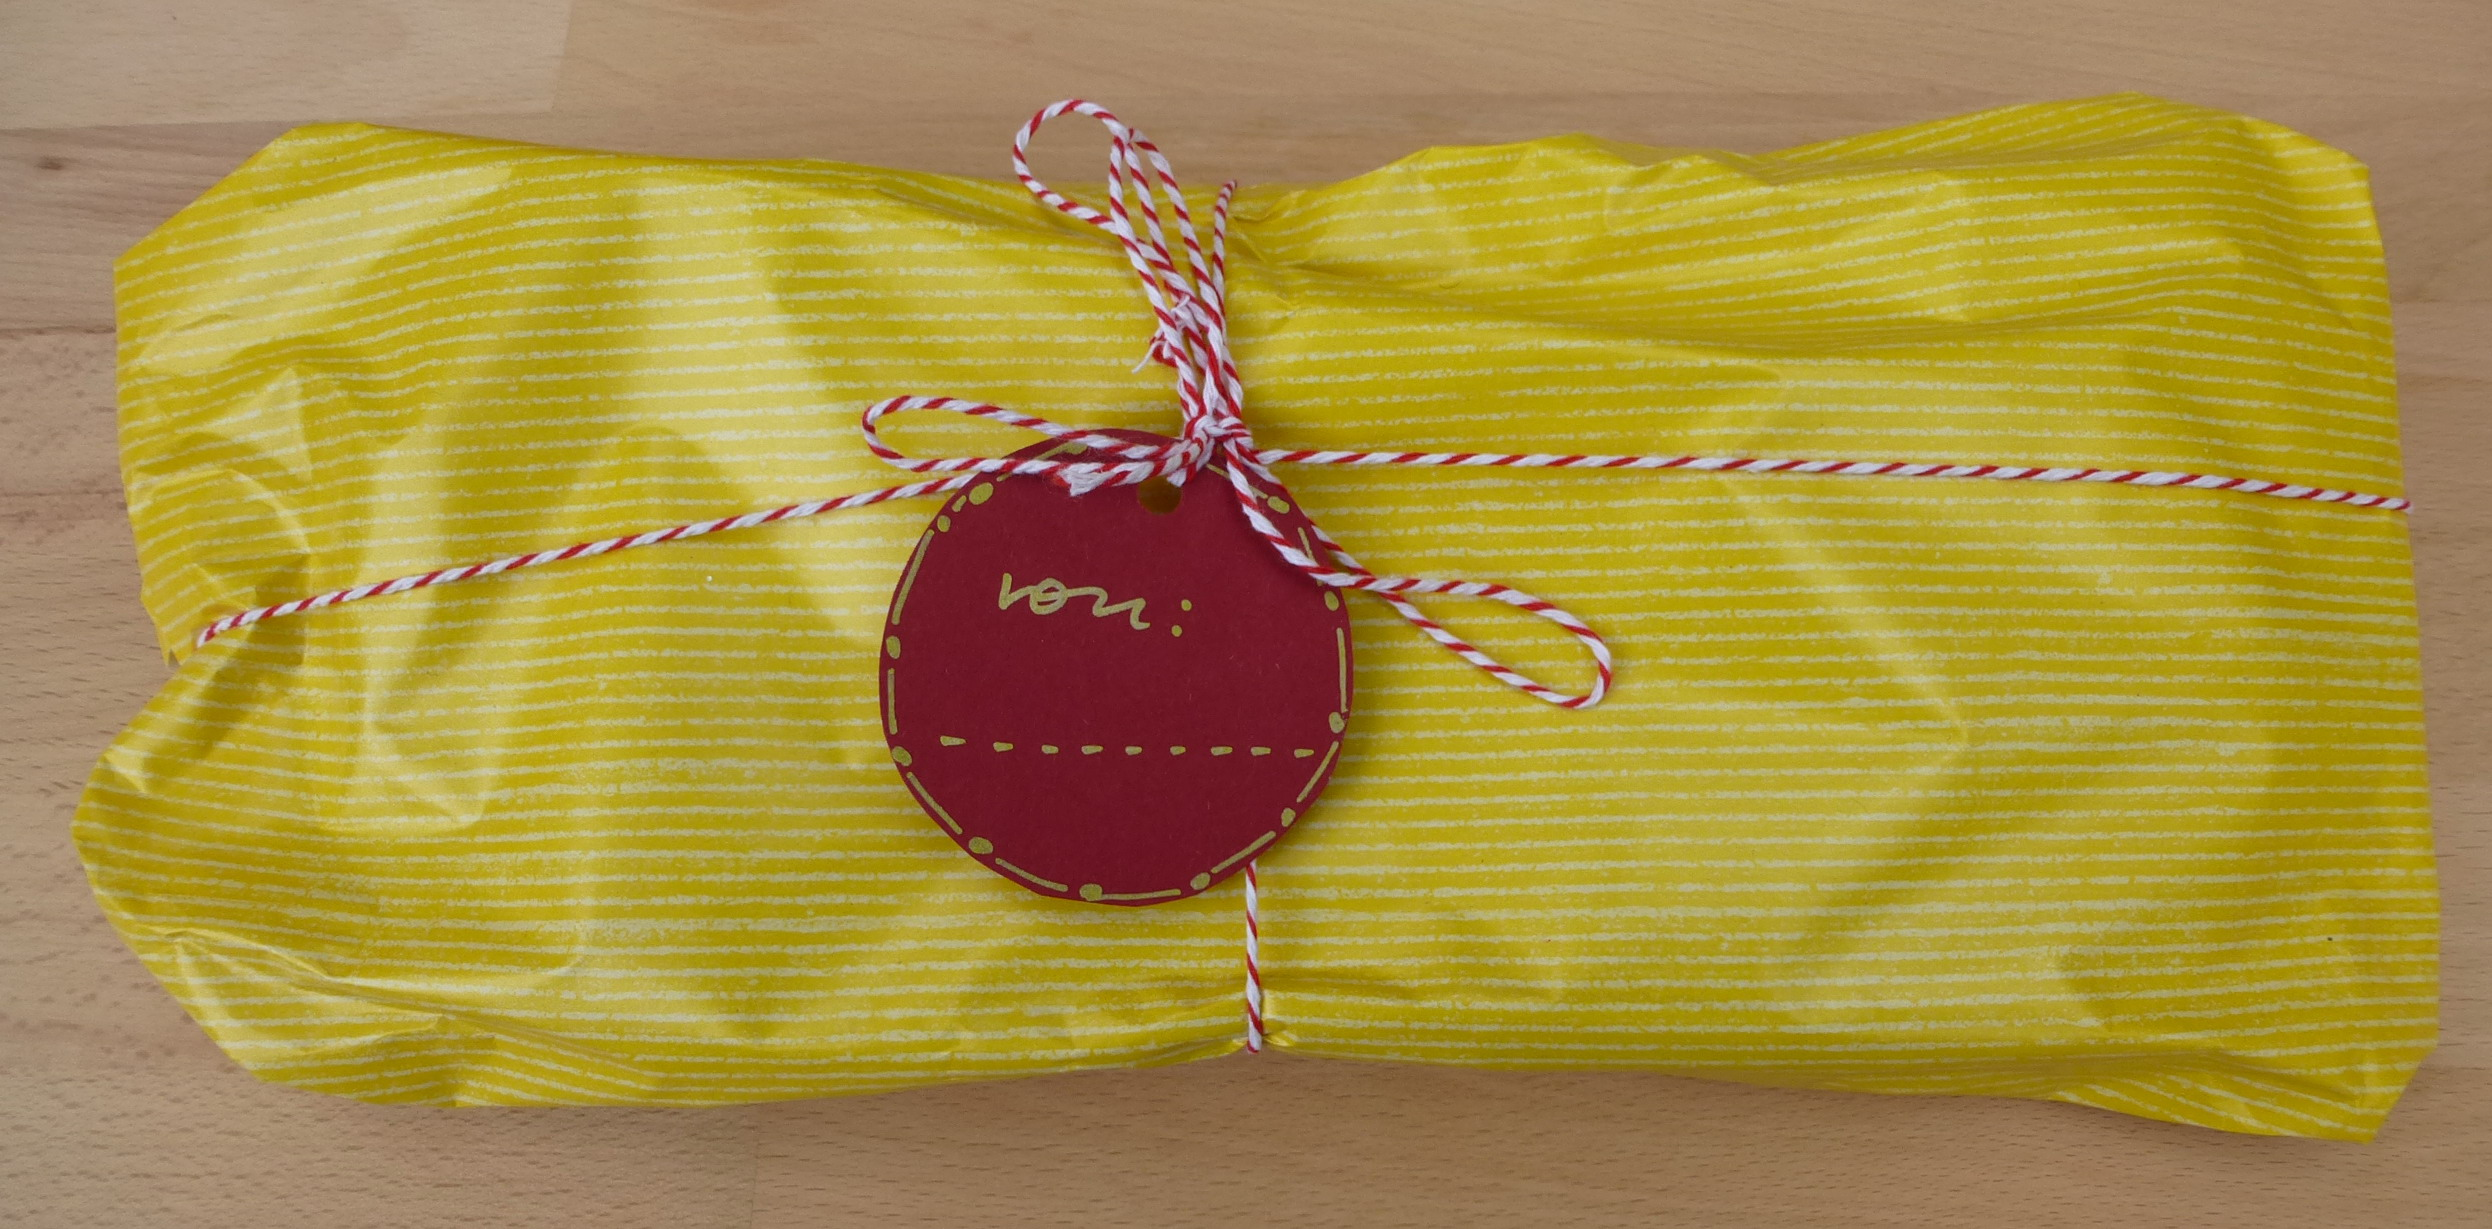 filzpantoffel-geschenkverpackung-gelb